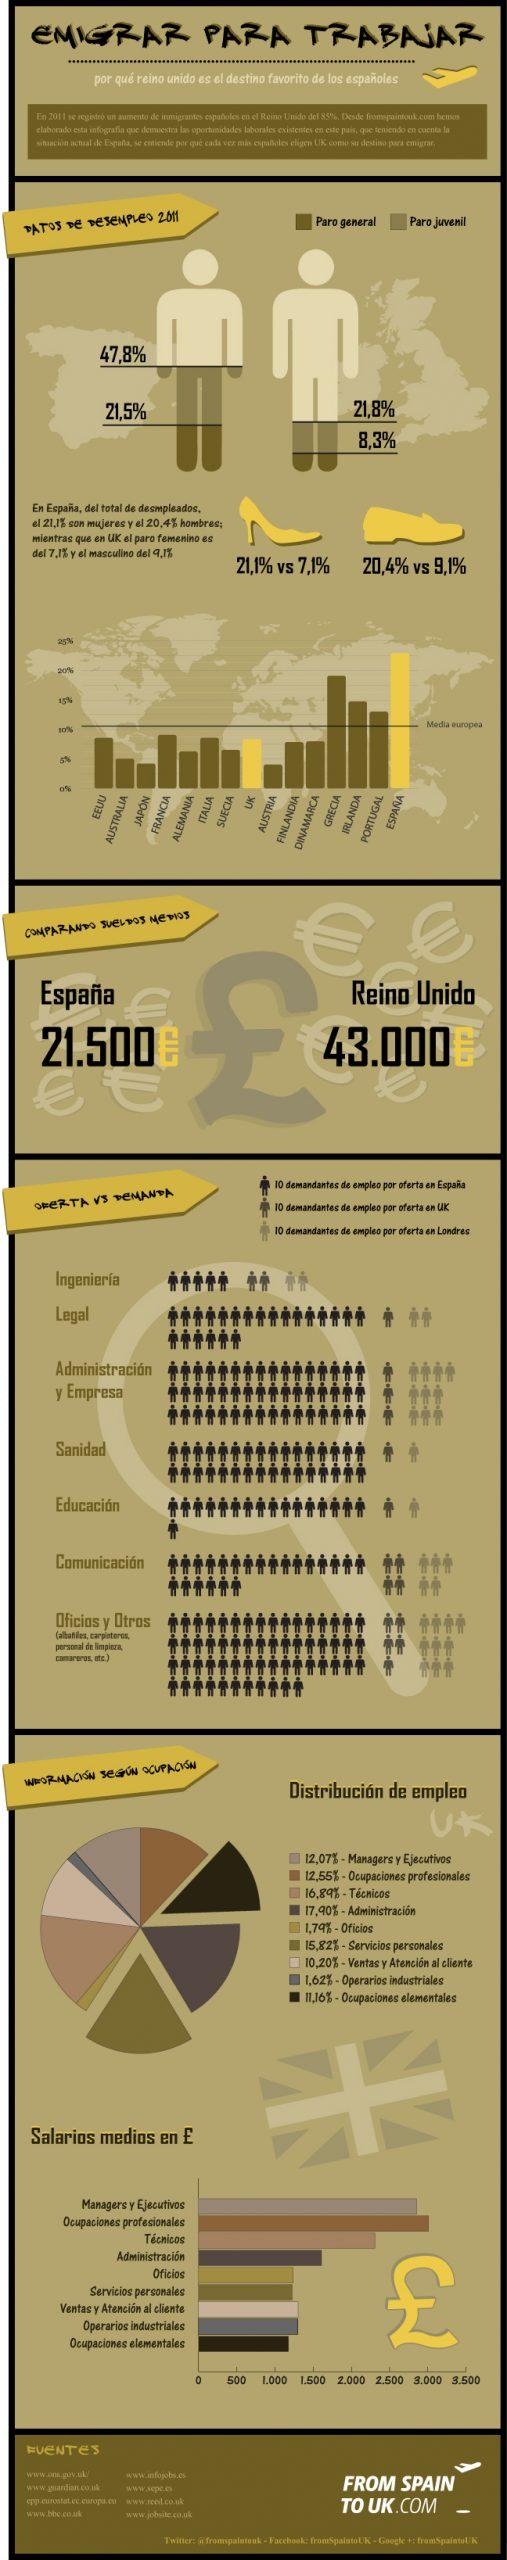 Emigrar para trabajar [Infografía]